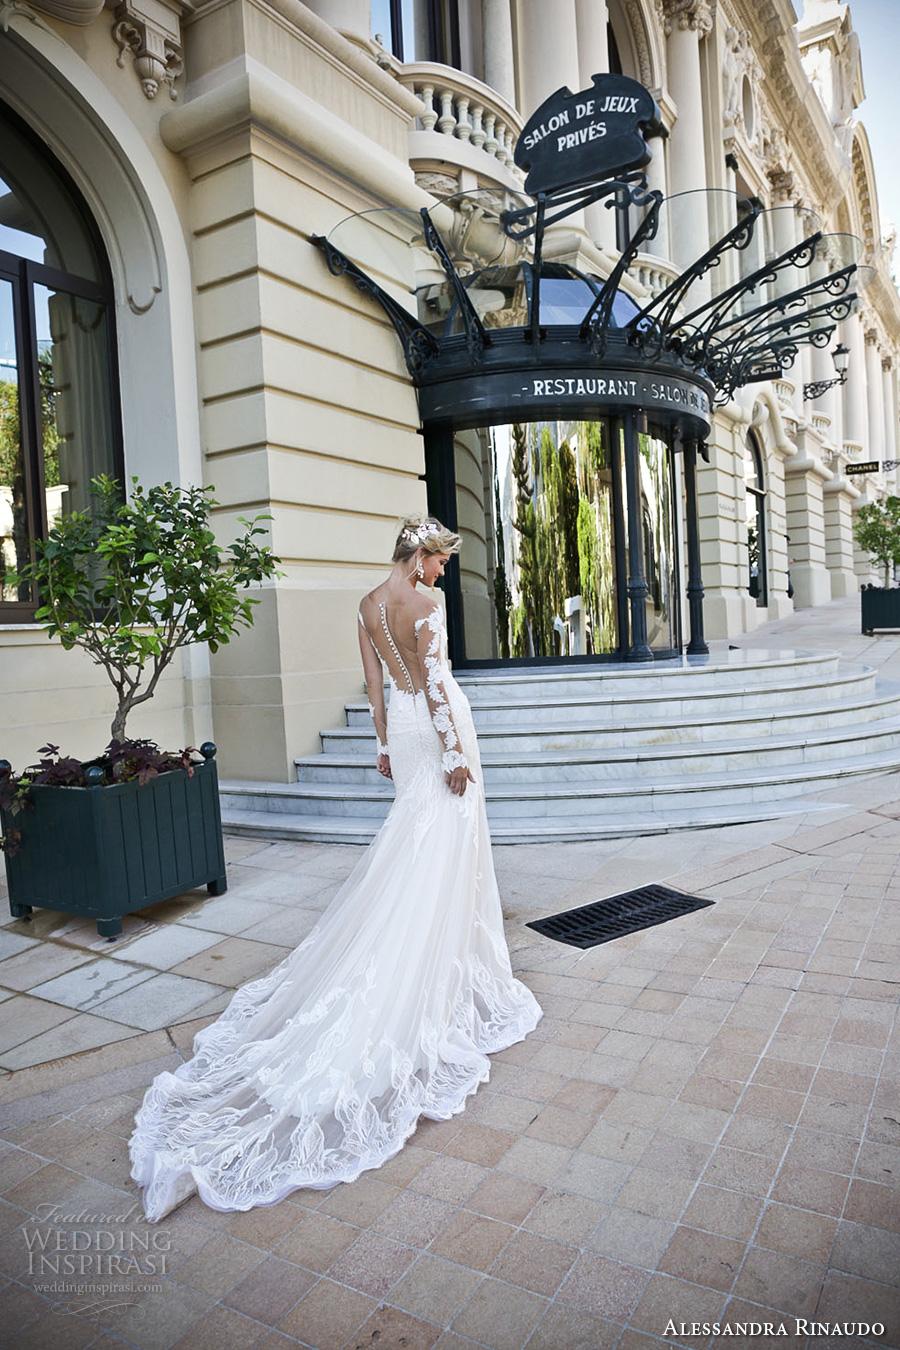 alessandra rinaudo 2017 bridal lace long sleeves illusion boat sweetheart neckline elegant fit and flare wedding dress illusion low back long train (15) bv